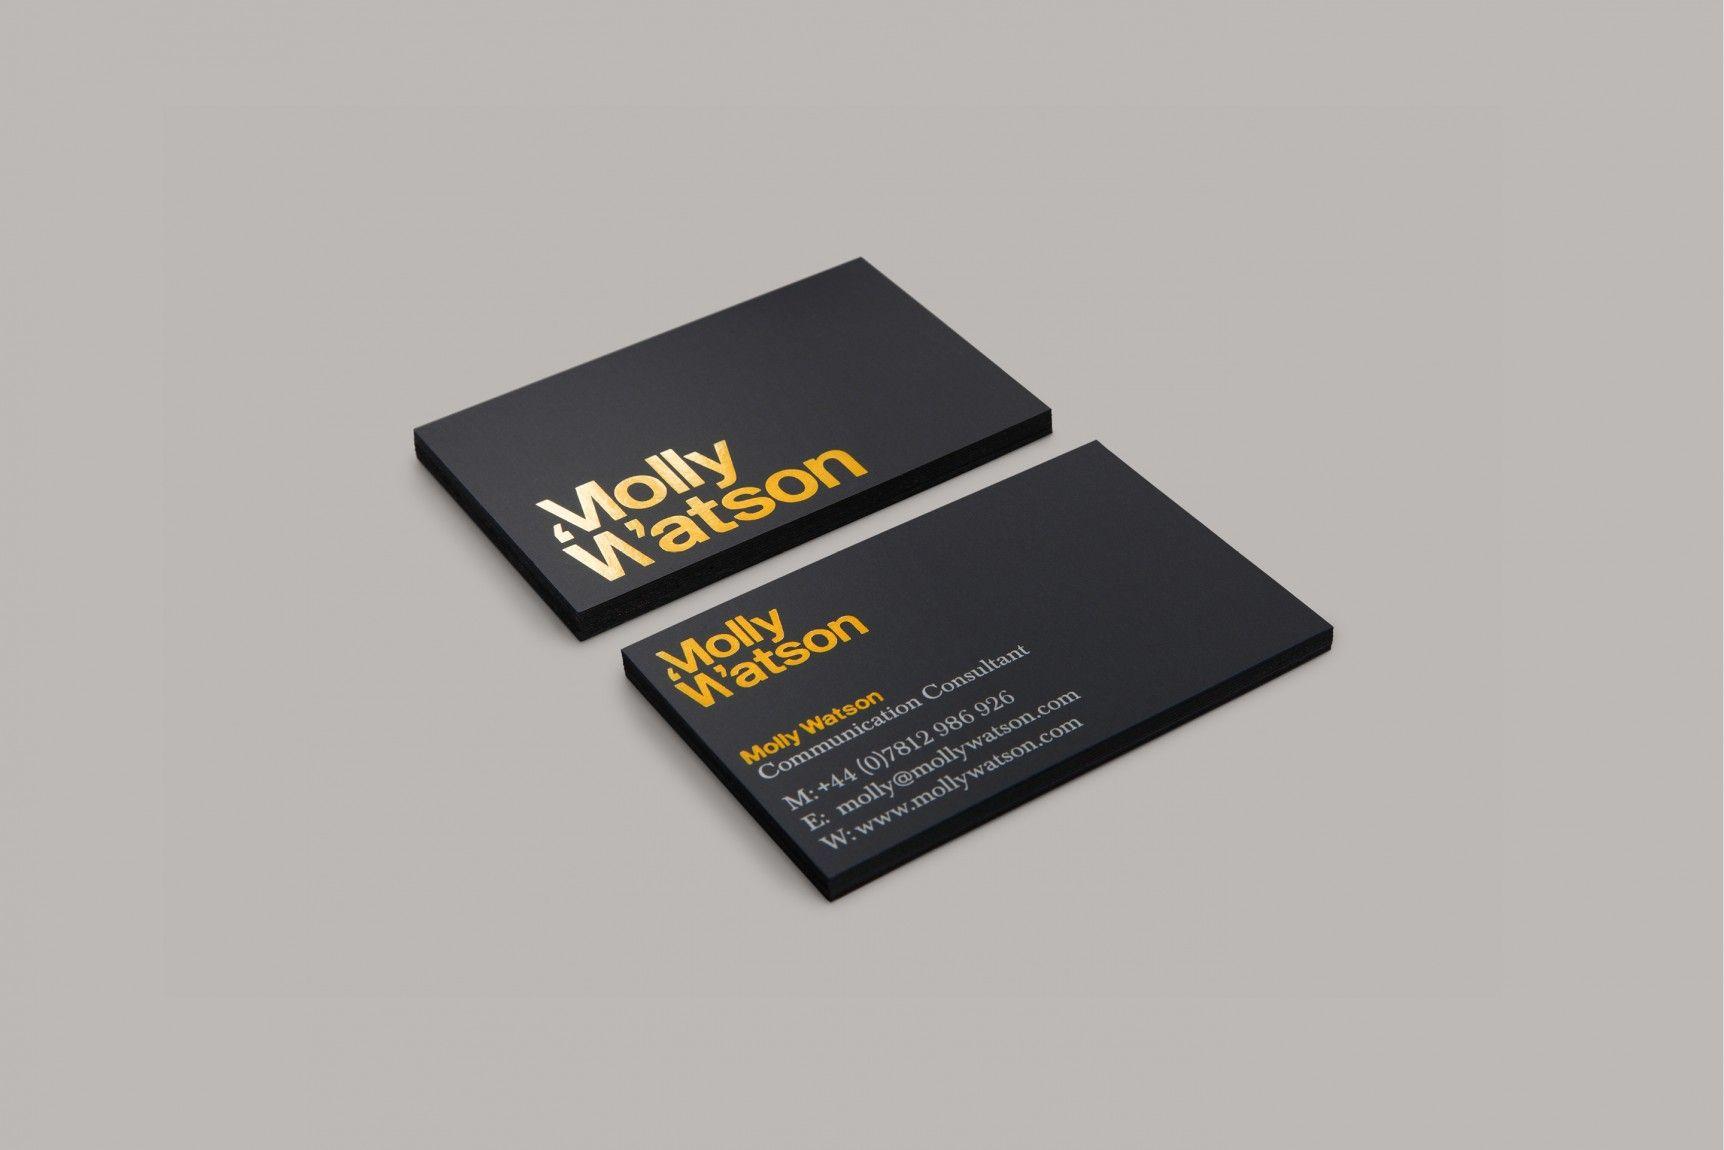 Branding business card design for molly watson a communications branding business card design for molly watson a communications specialist by studio blackburn reheart Choice Image